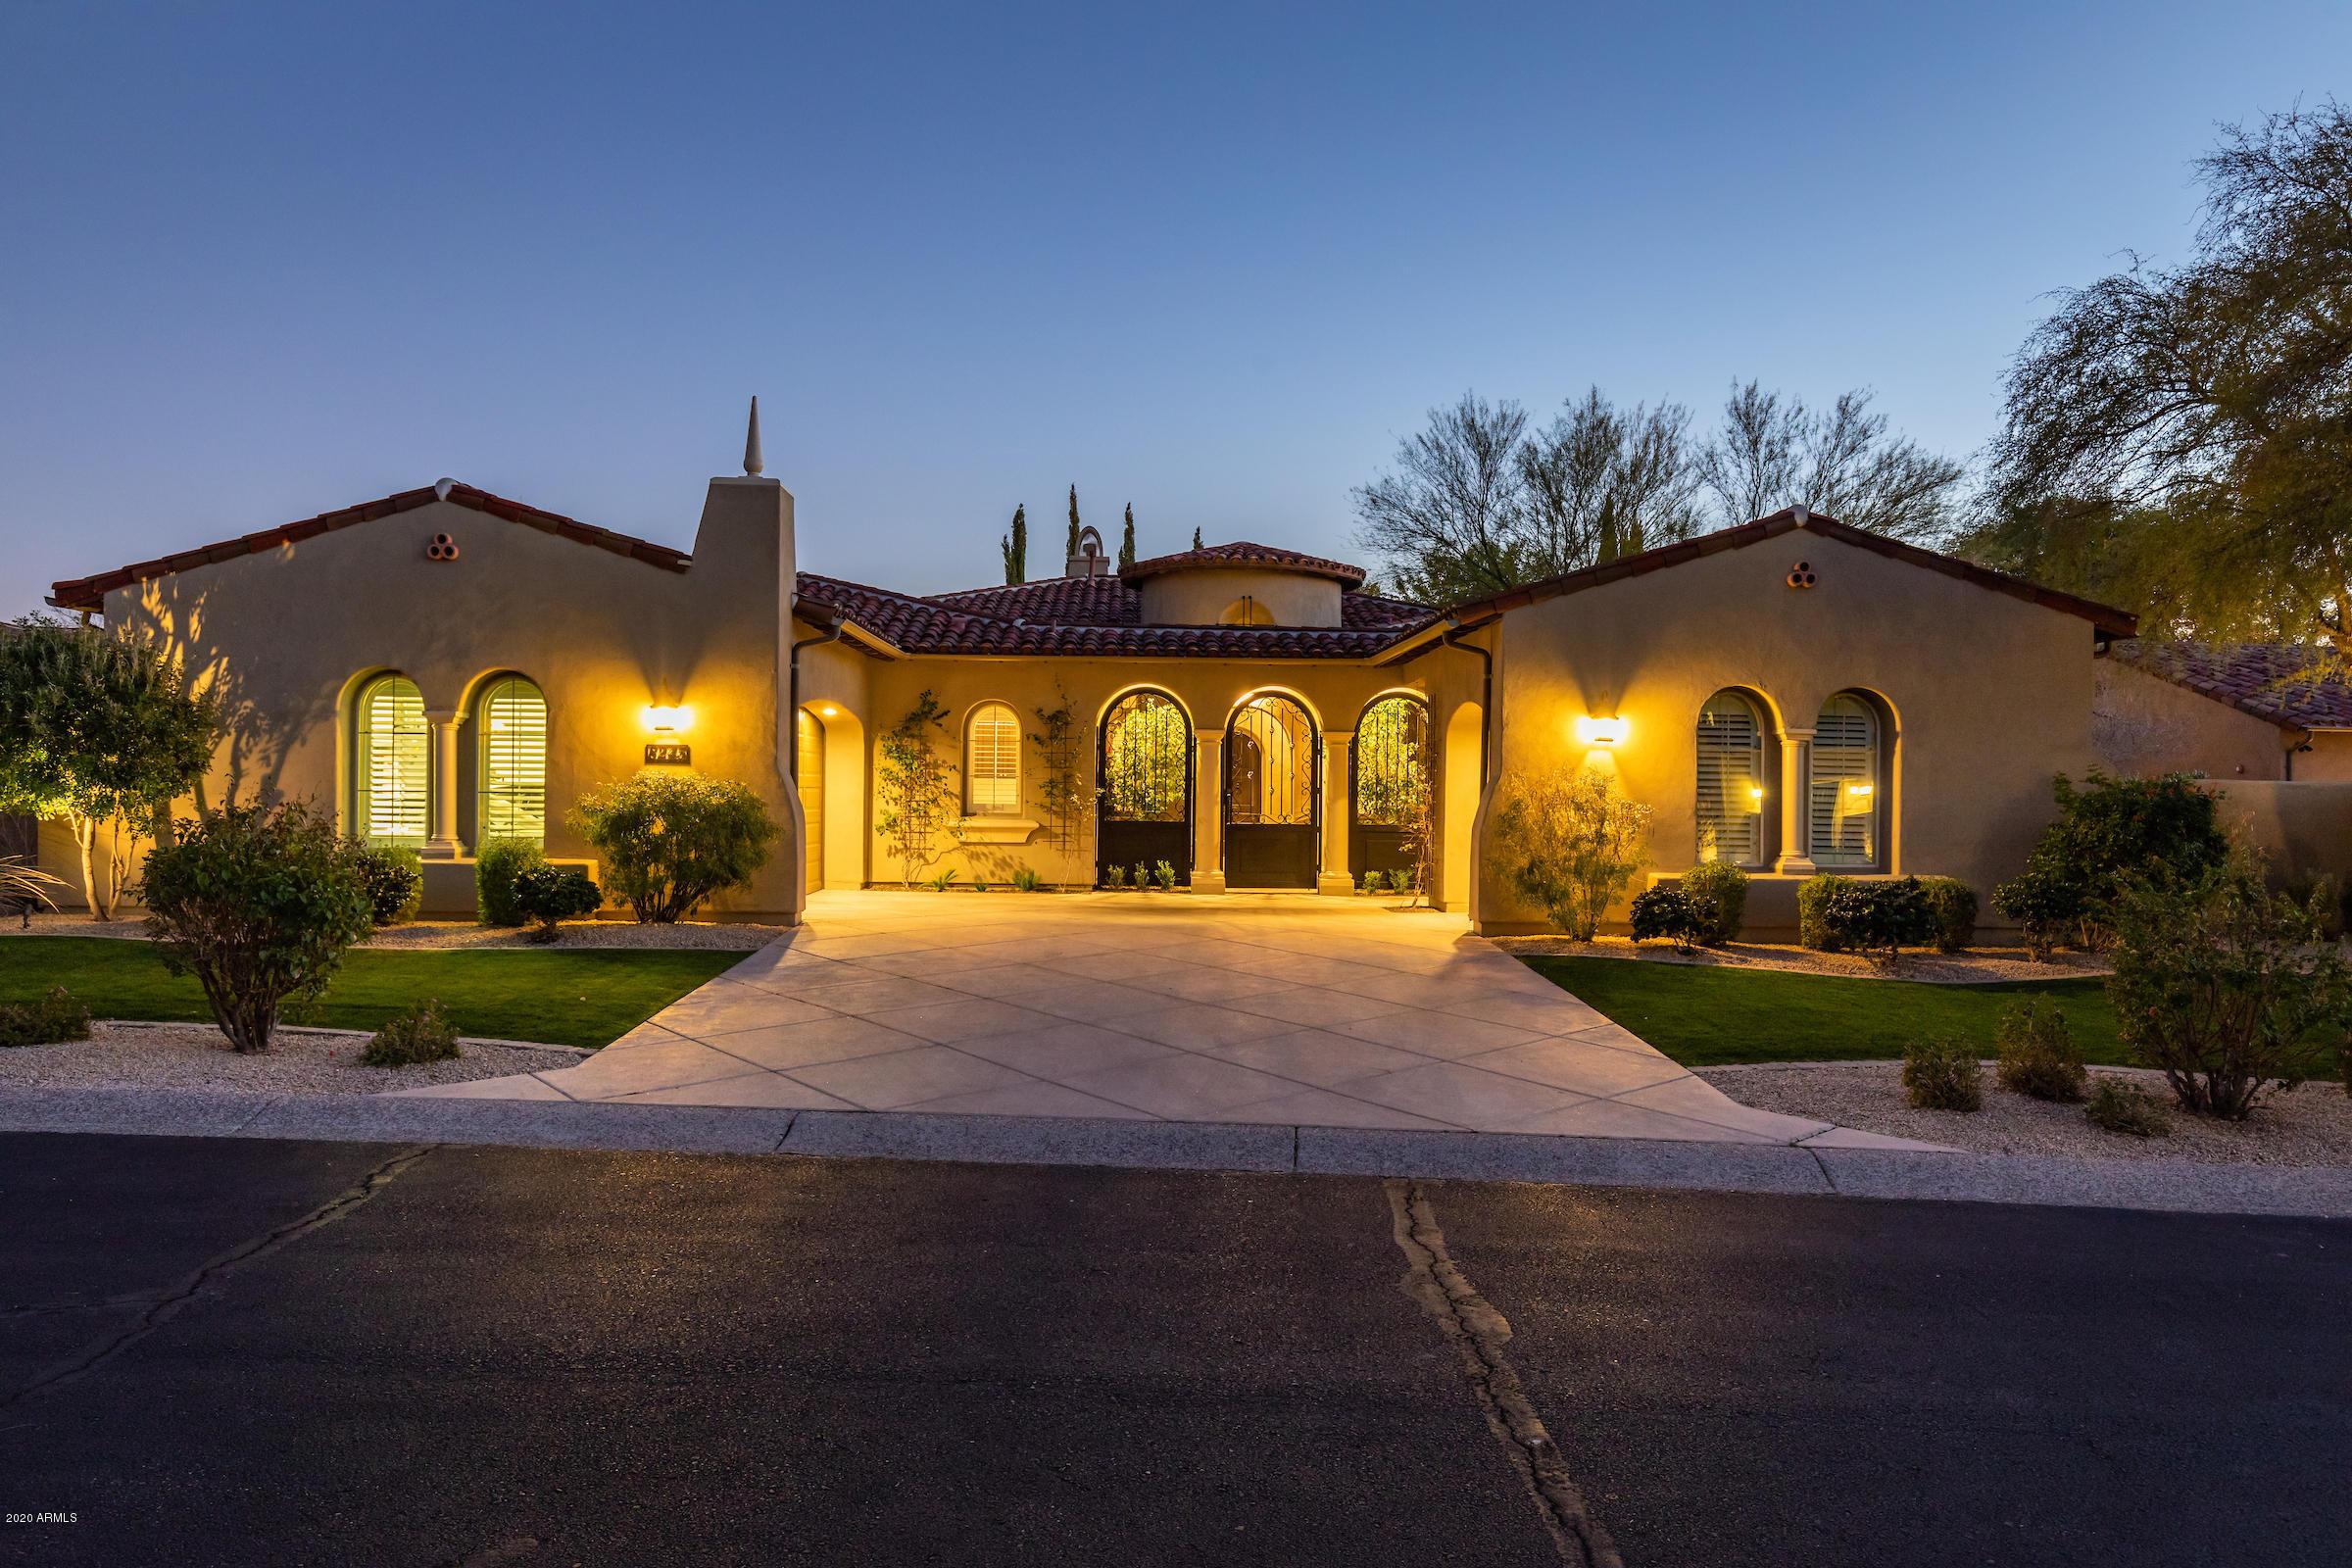 Photo of 8245 E WINGSPAN Way, Scottsdale, AZ 85255